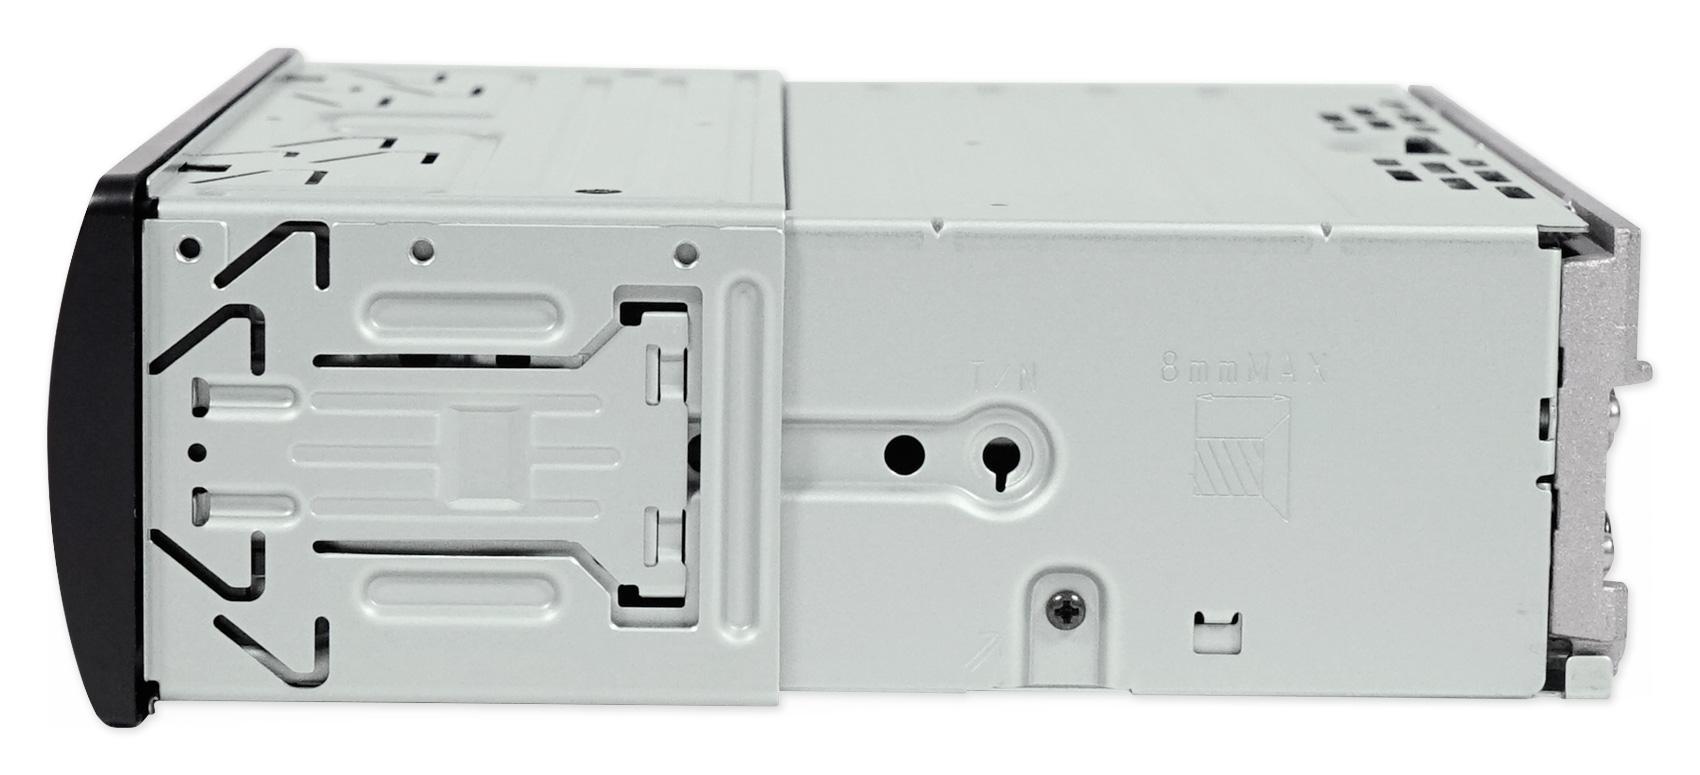 Alpine Bluetooth Cd Player Usb  Aux Siriusxm For 2010